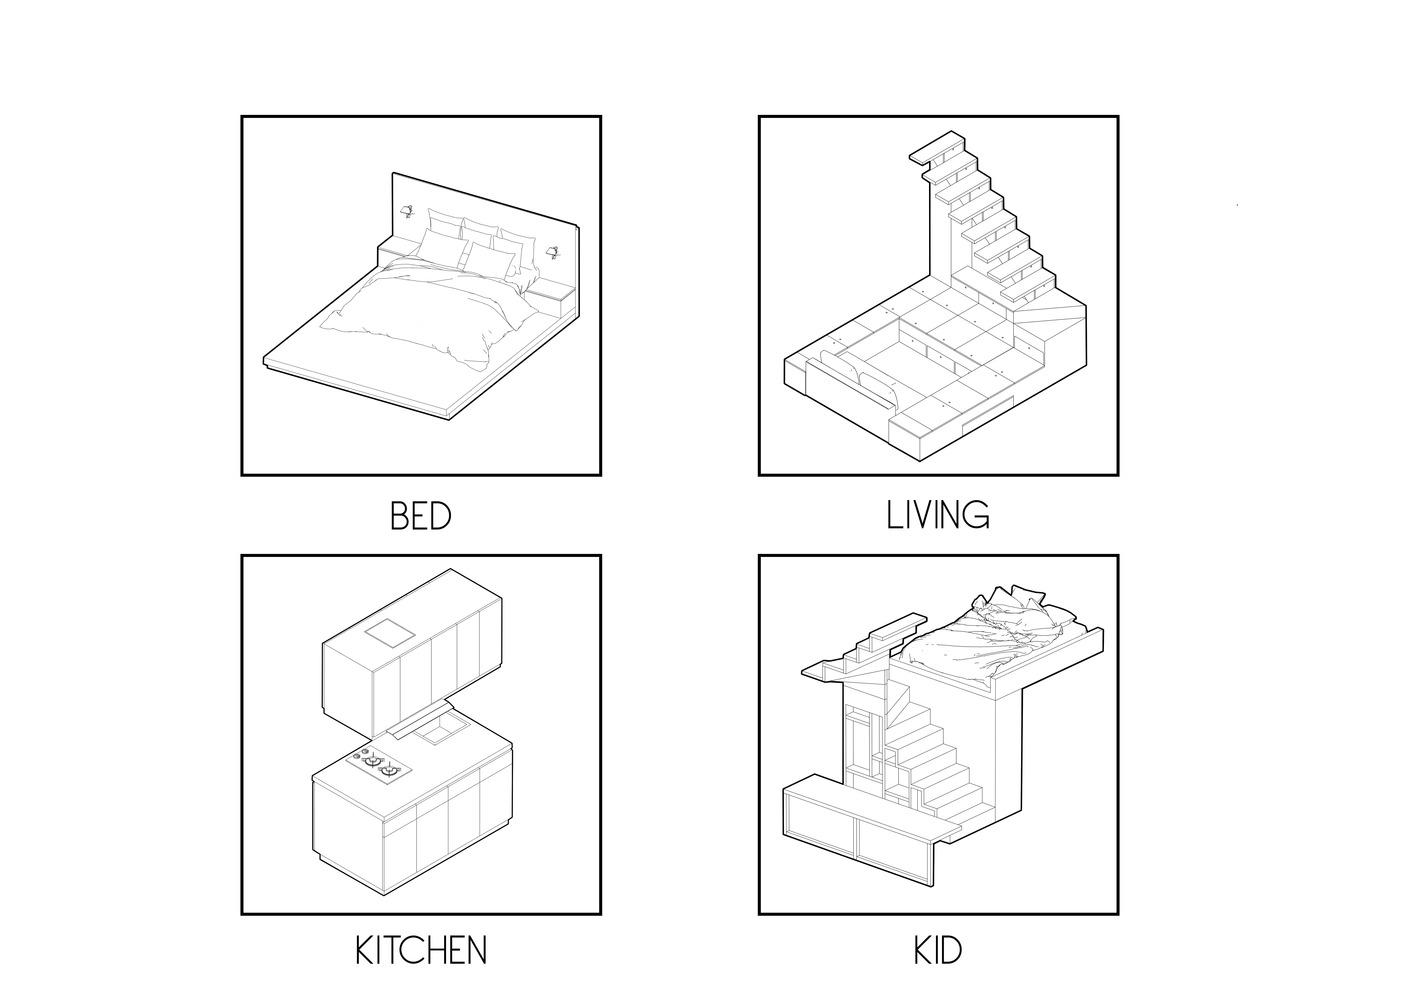 medium resolution of 3500 millimetre house plug and play diagram